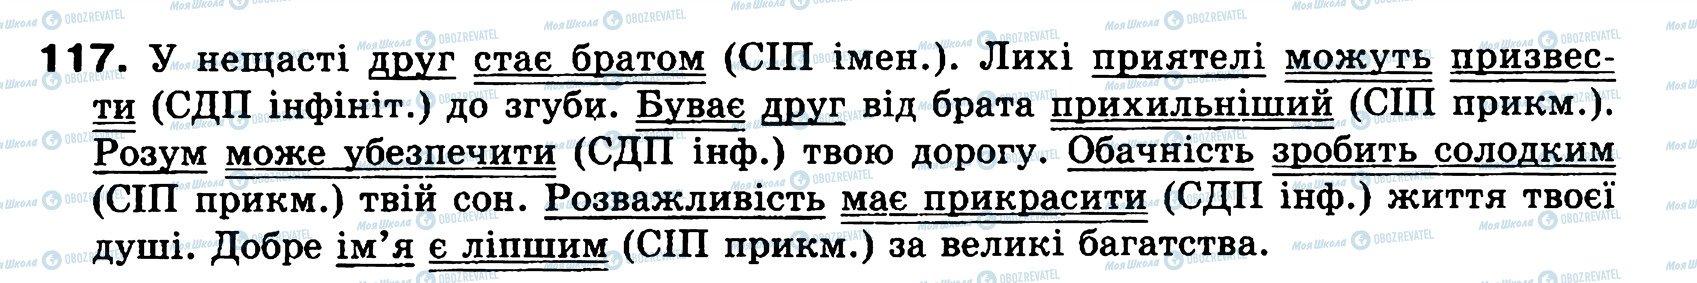 ГДЗ Укр мова 8 класс страница 117